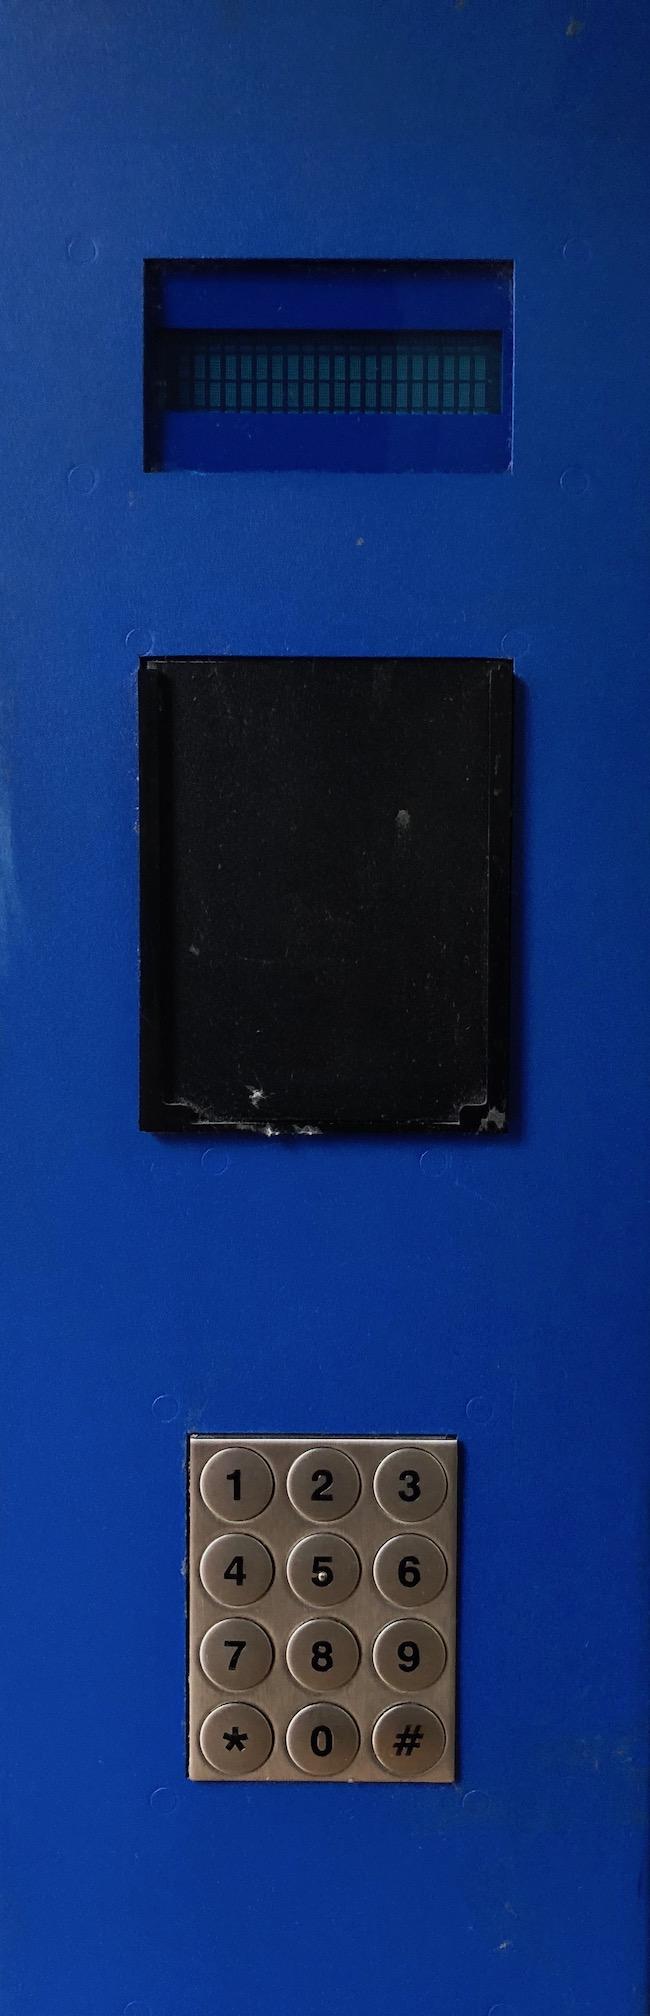 Fastenal vending machine keypad (metal buttons) Custom Cover